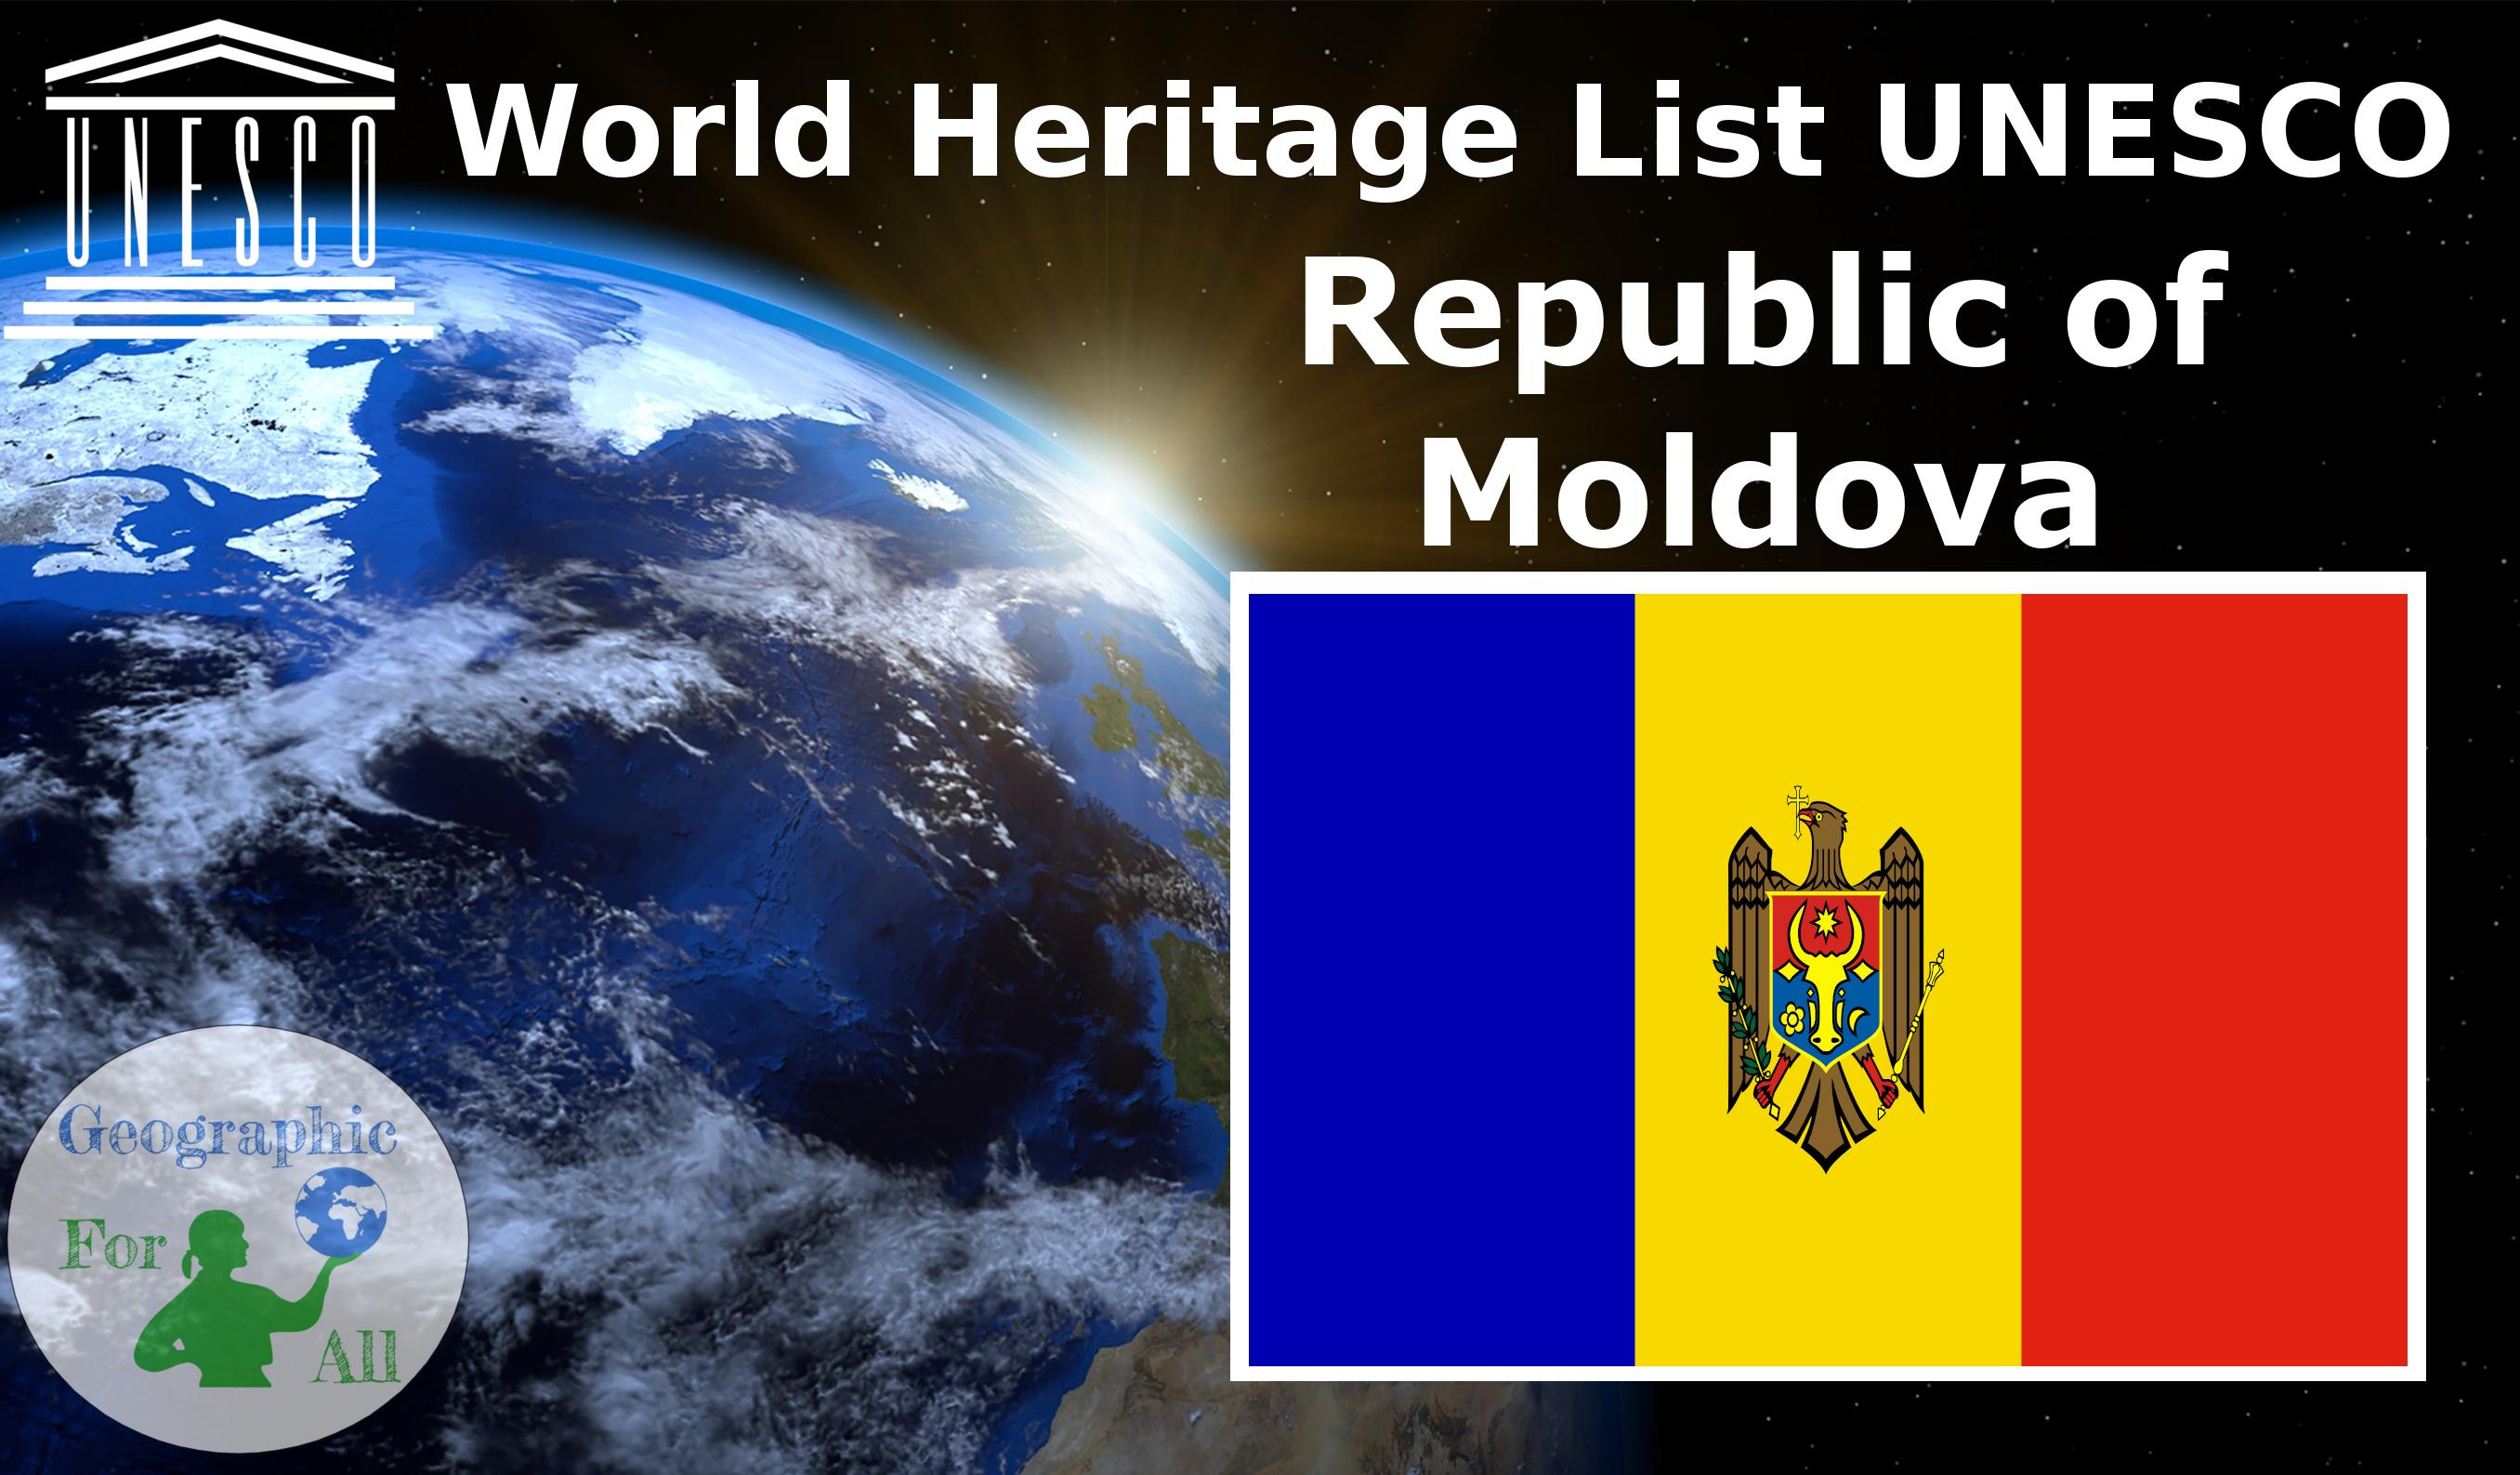 World Heritage List UNESCO - Republic of Moldova